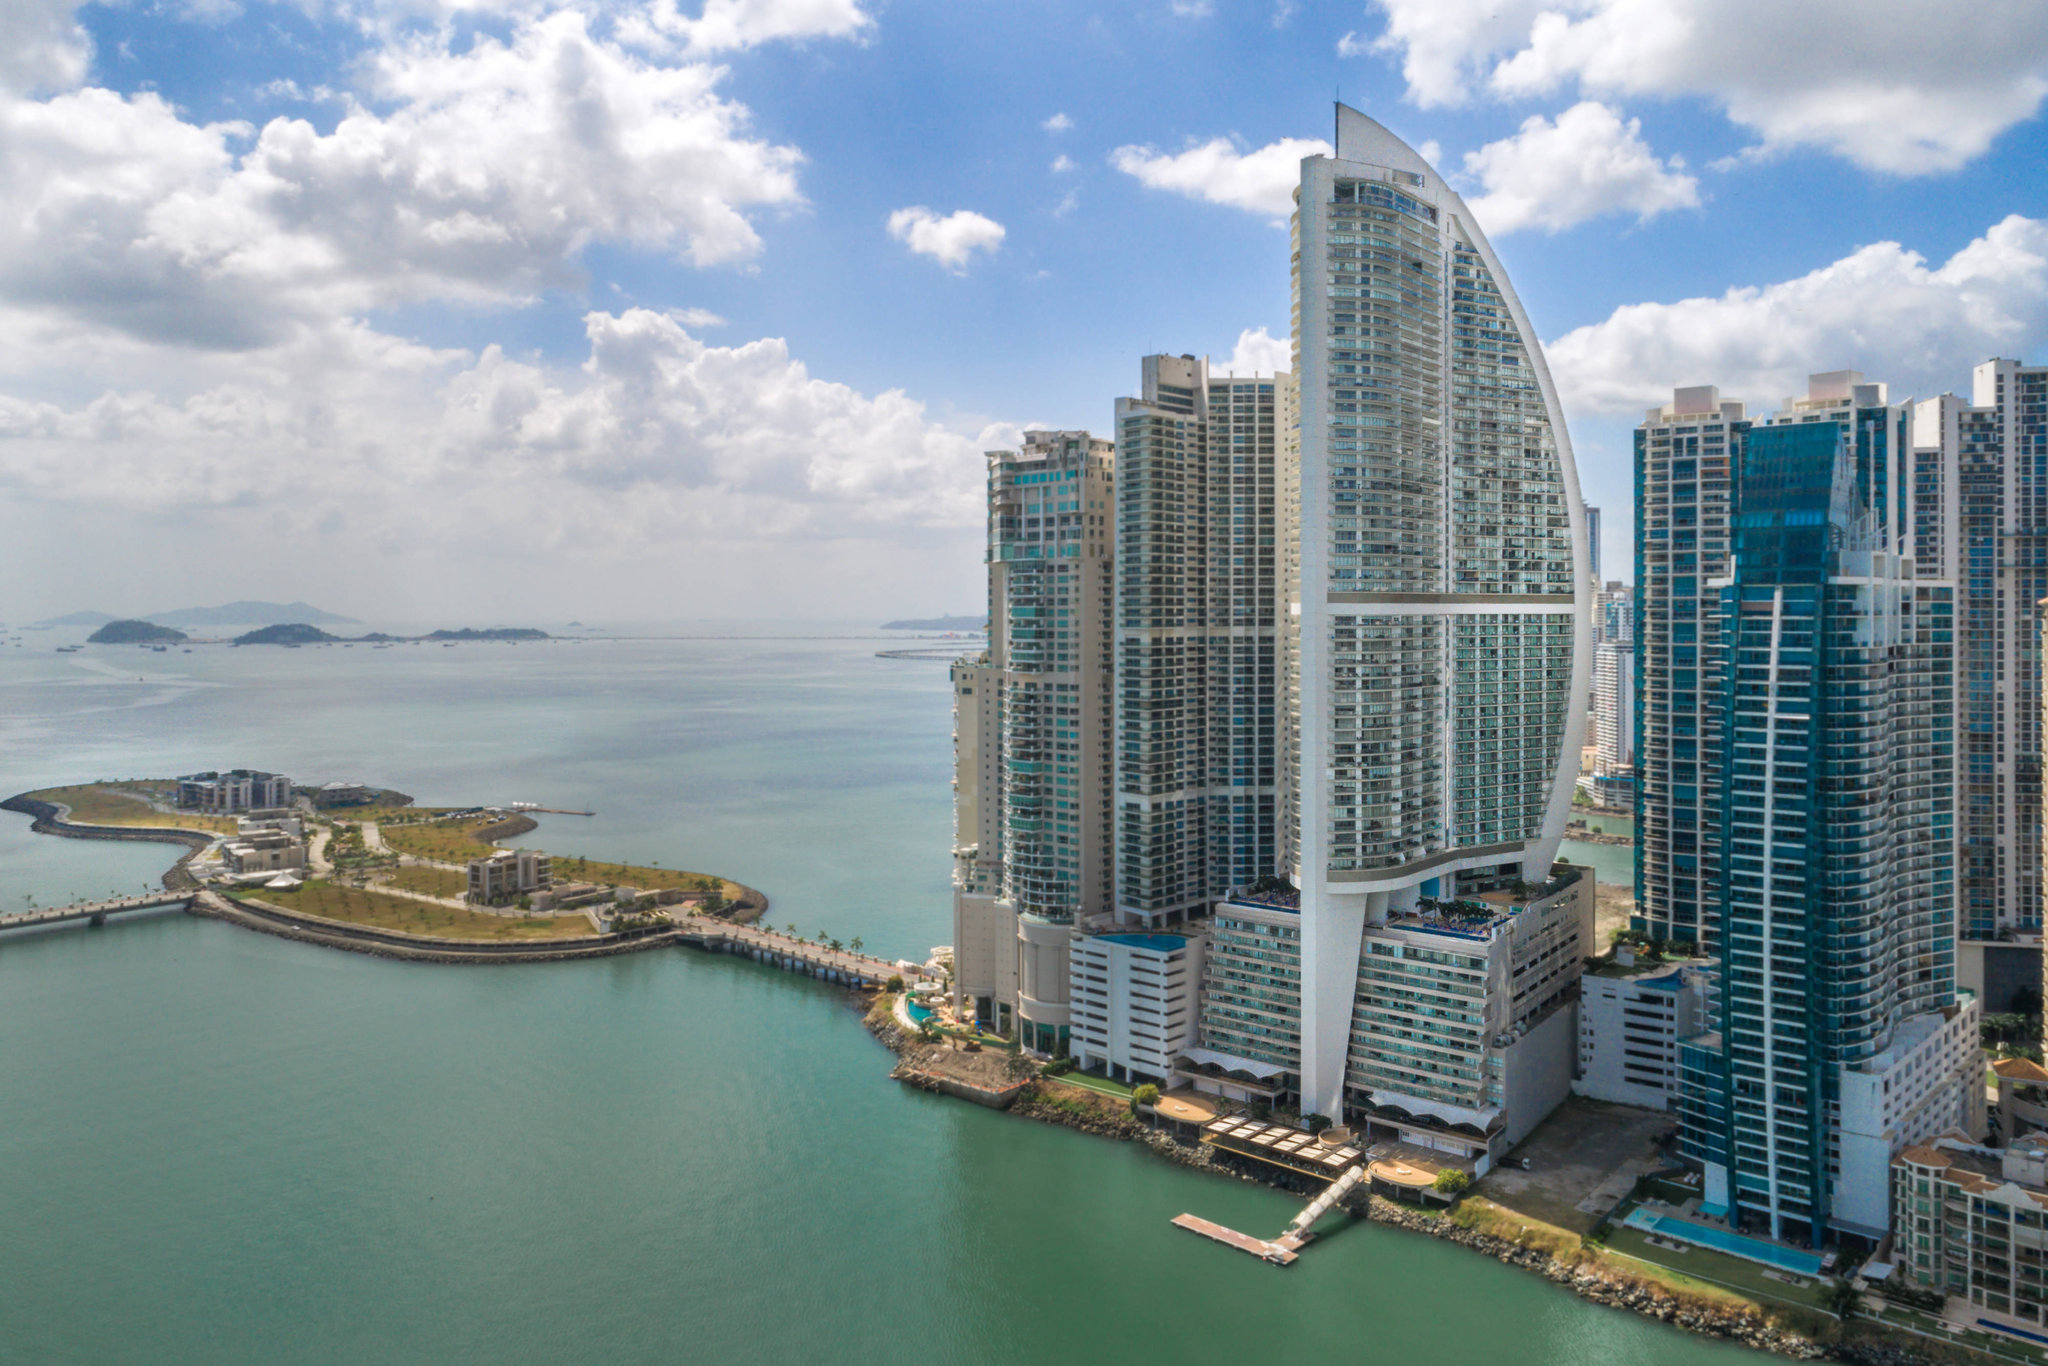 JW Marriott Panama City